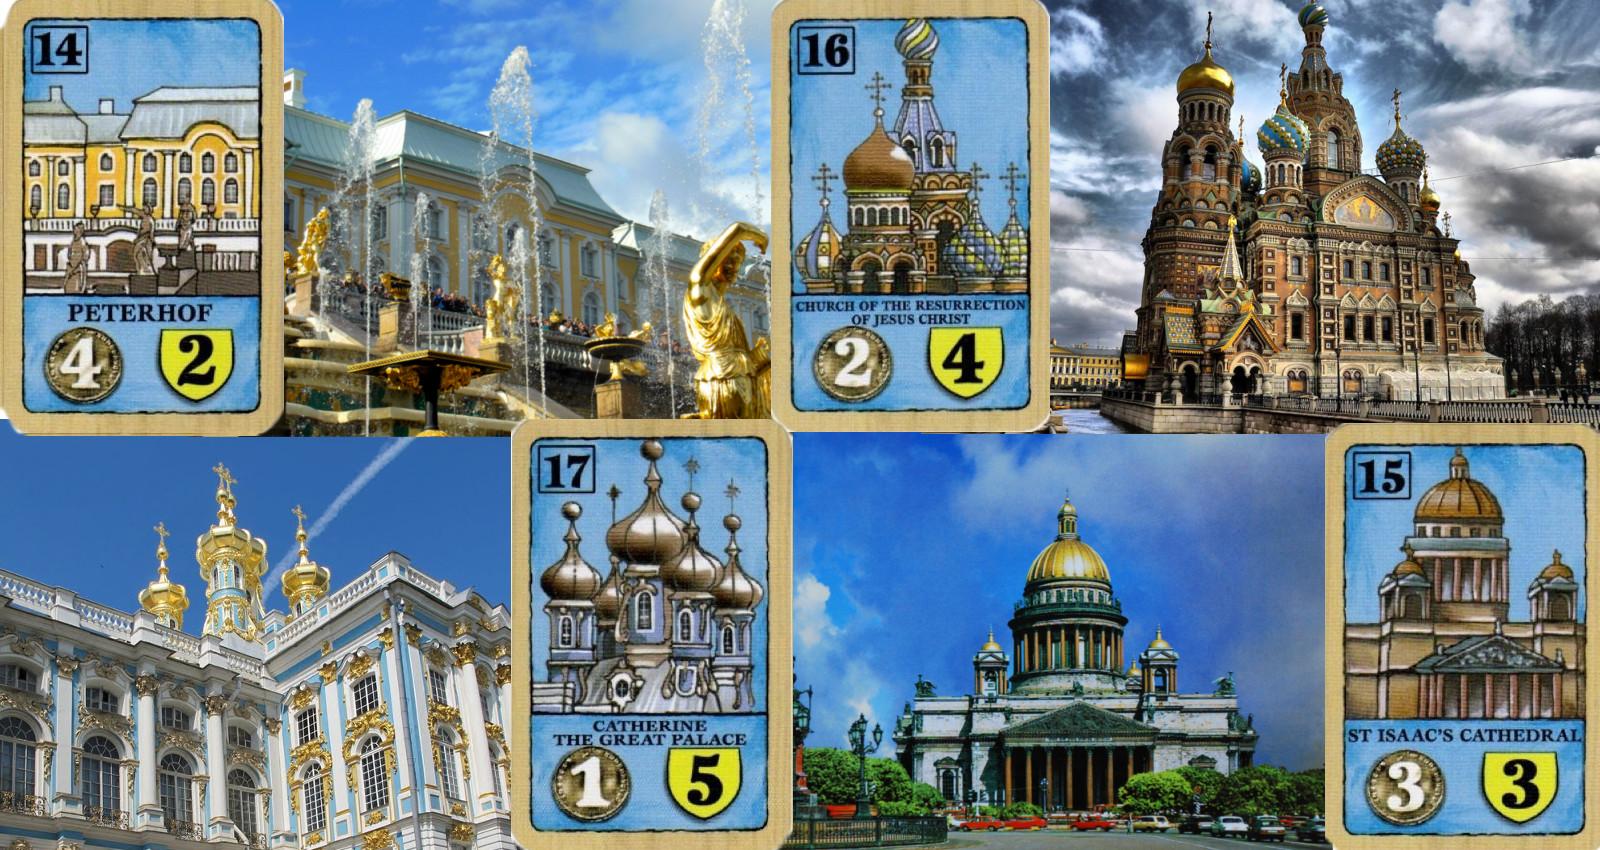 Peterhof - Iglesia del Salvador sobre la Sangre Derramada - Palacio de Catalina - Catedral de San Isaac